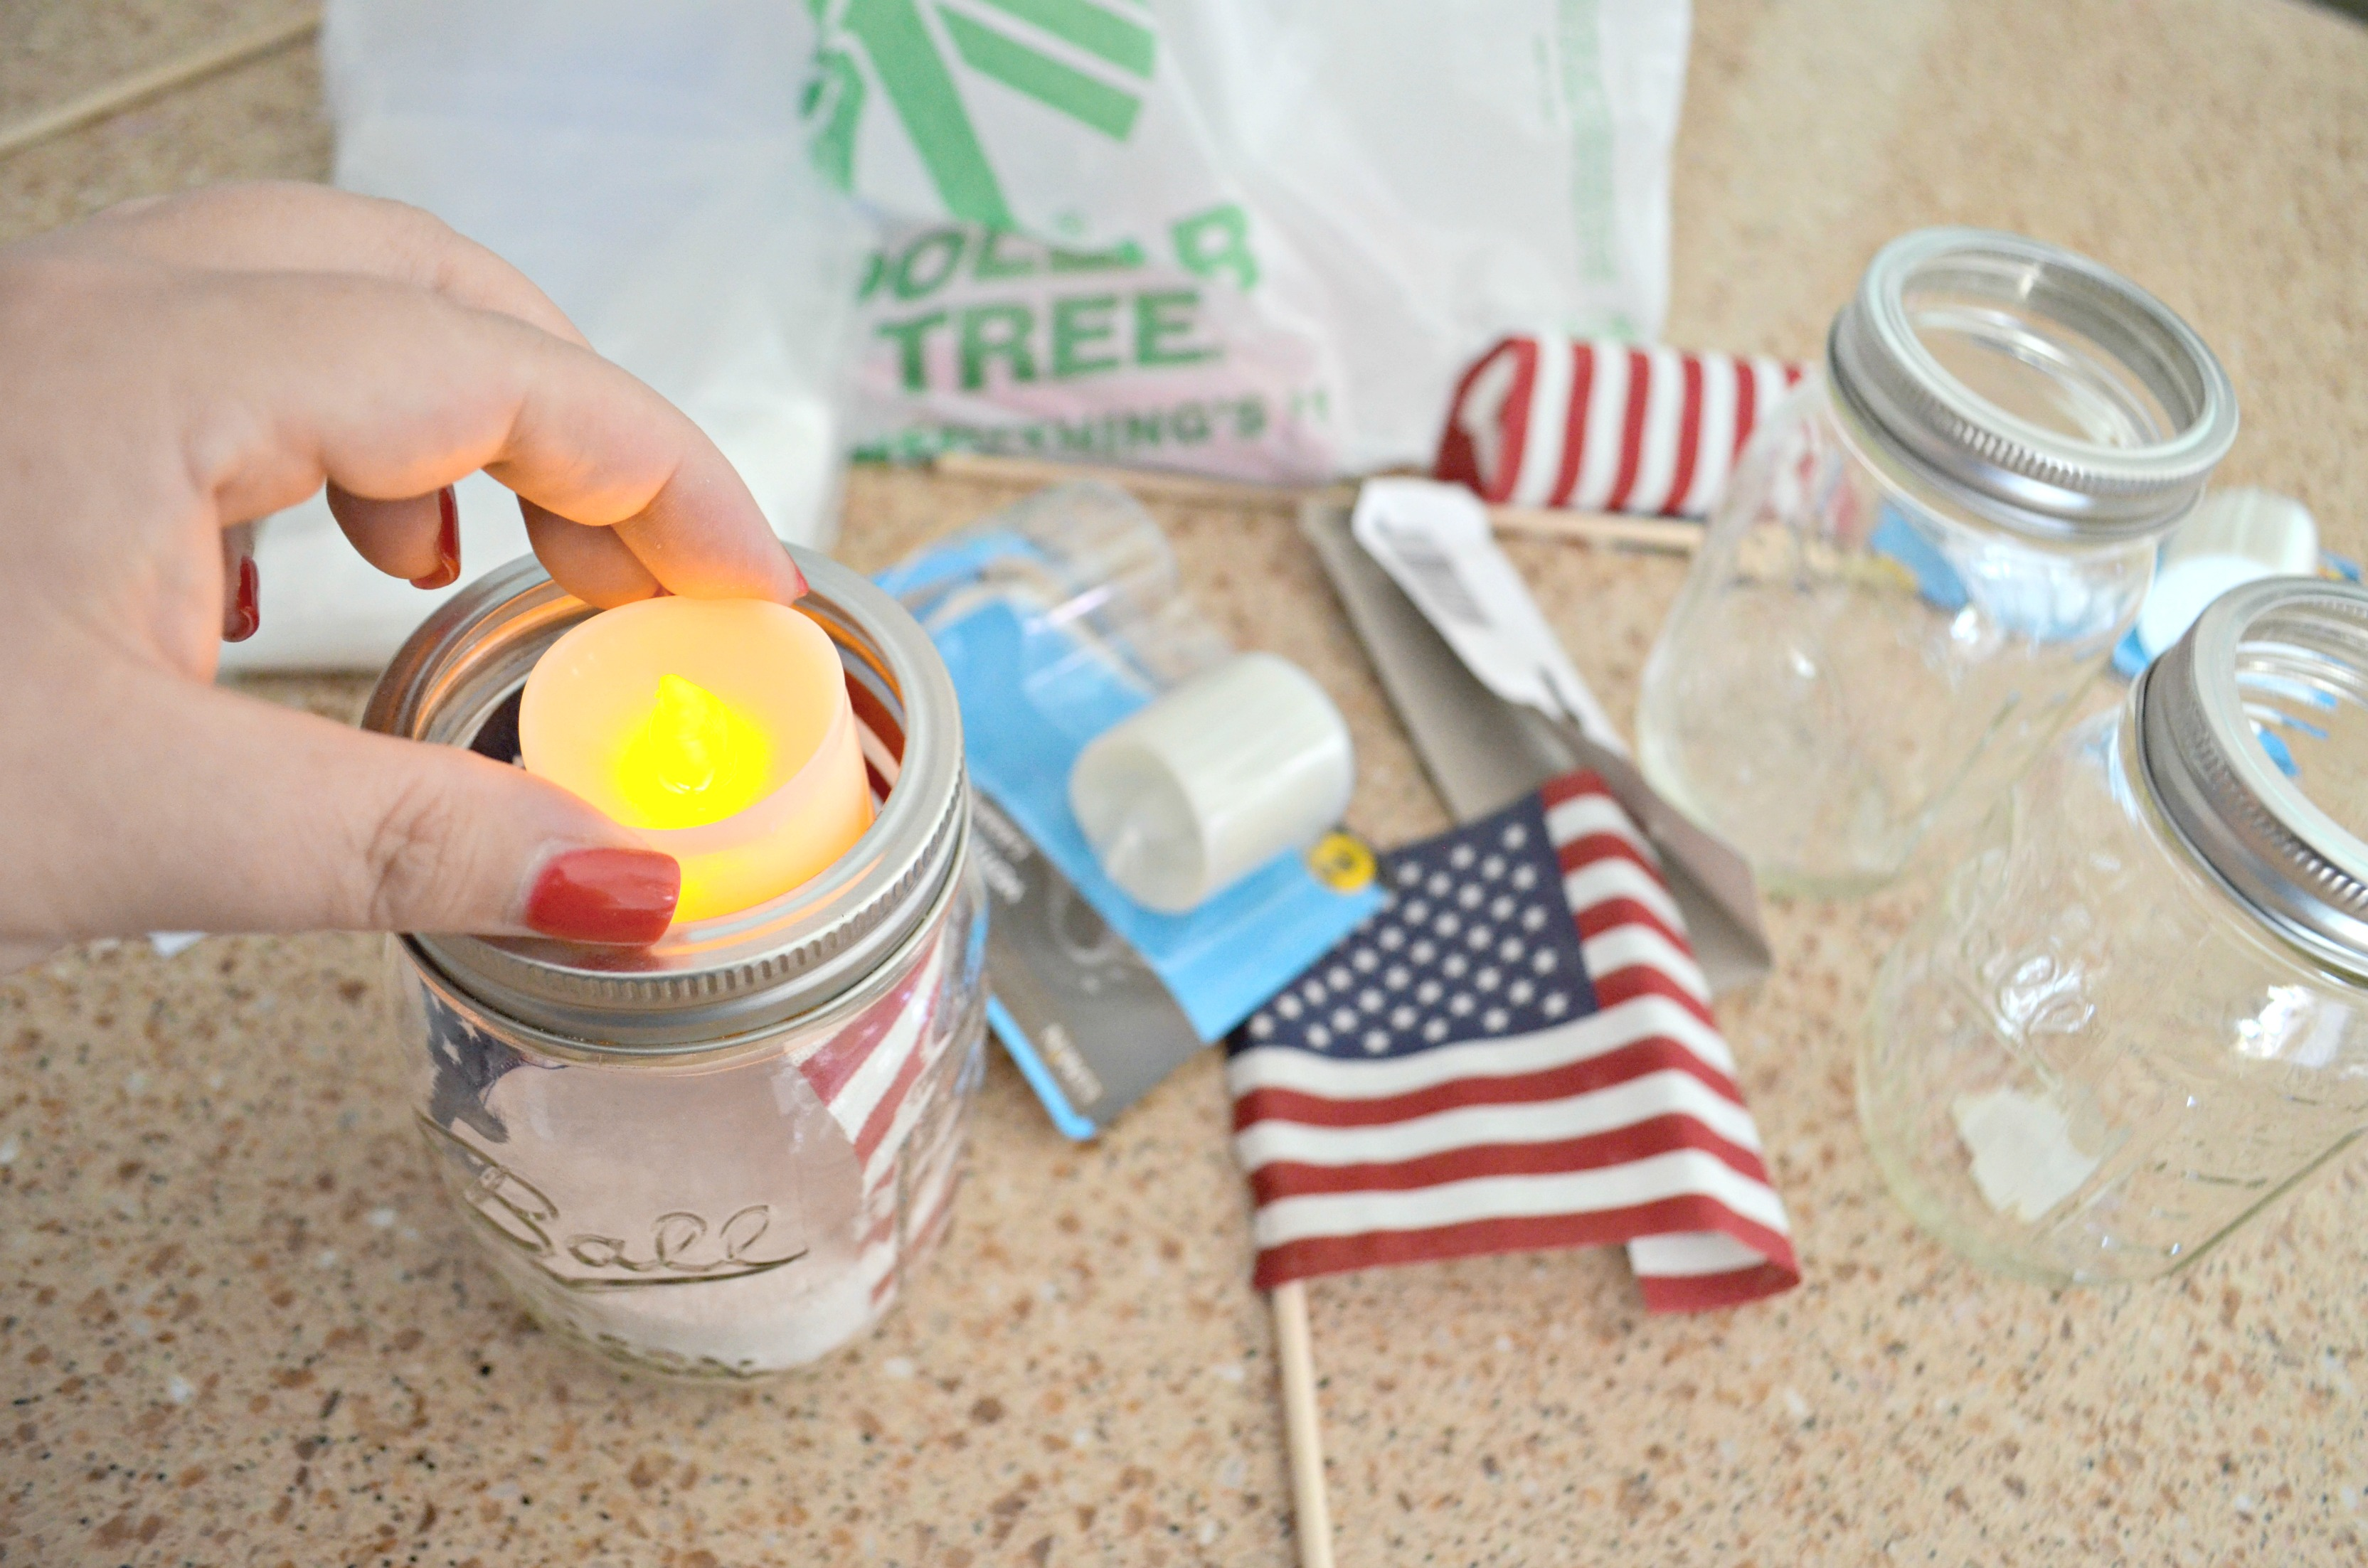 Dollar Tree 4th of July Craft Mason Jar Votives – adding flameless candles